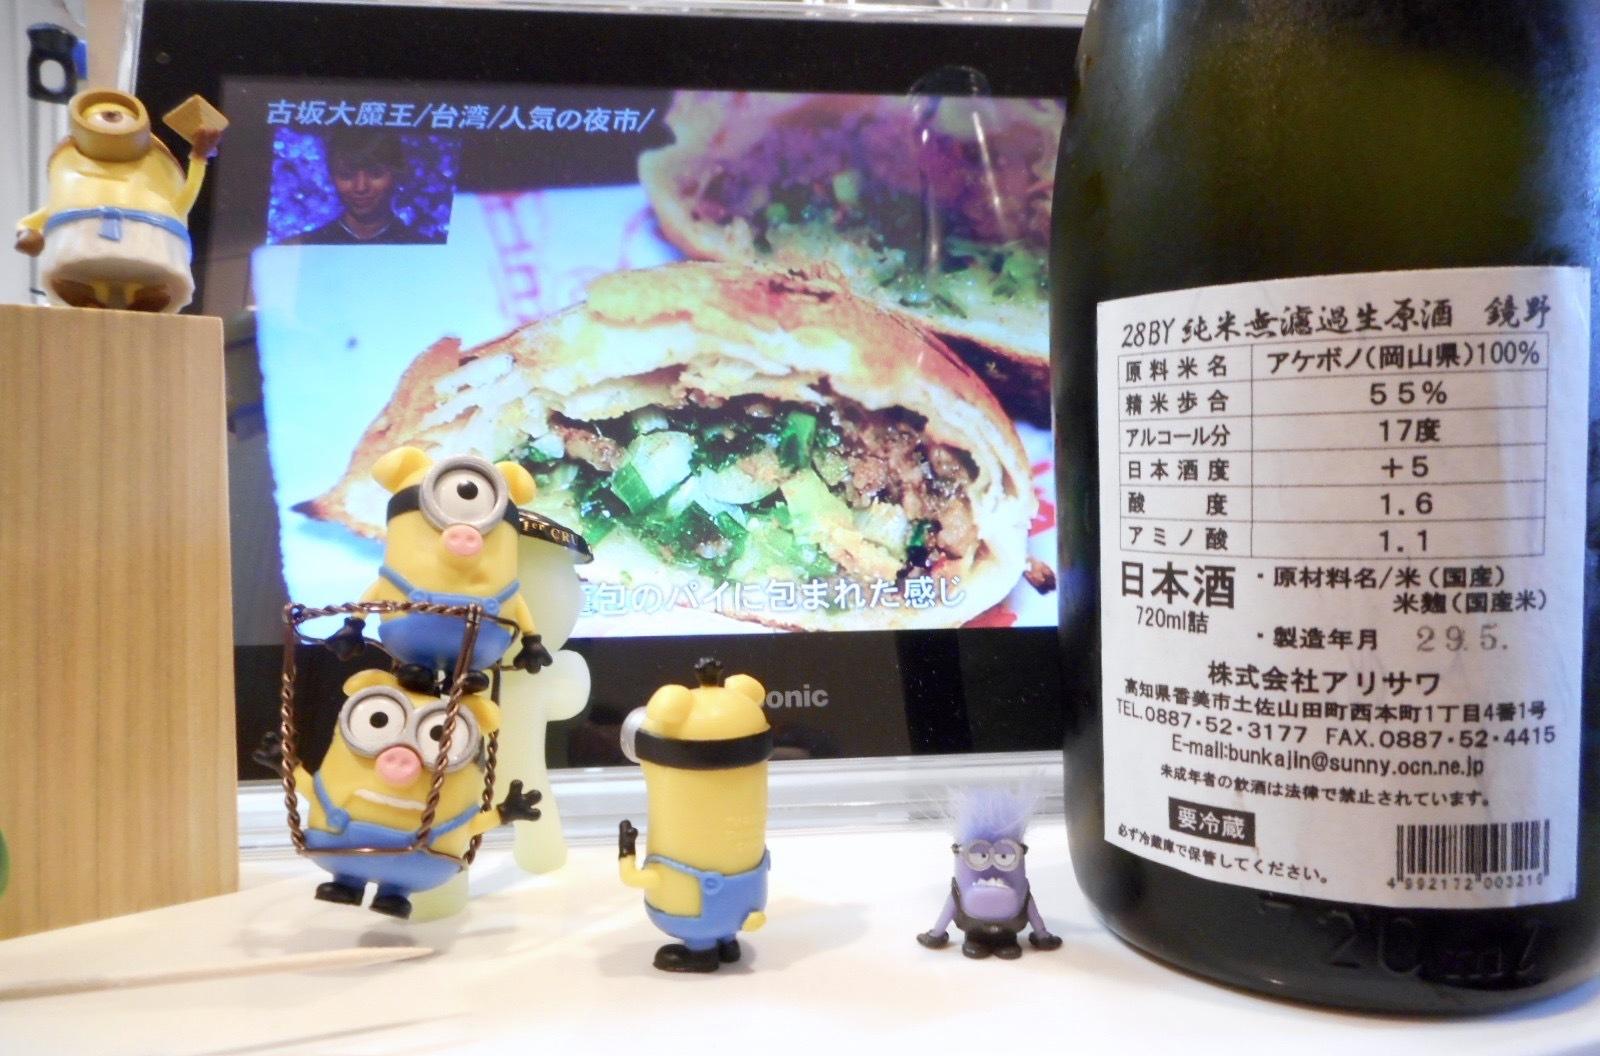 kagamino_junmai_nama28by2.jpg